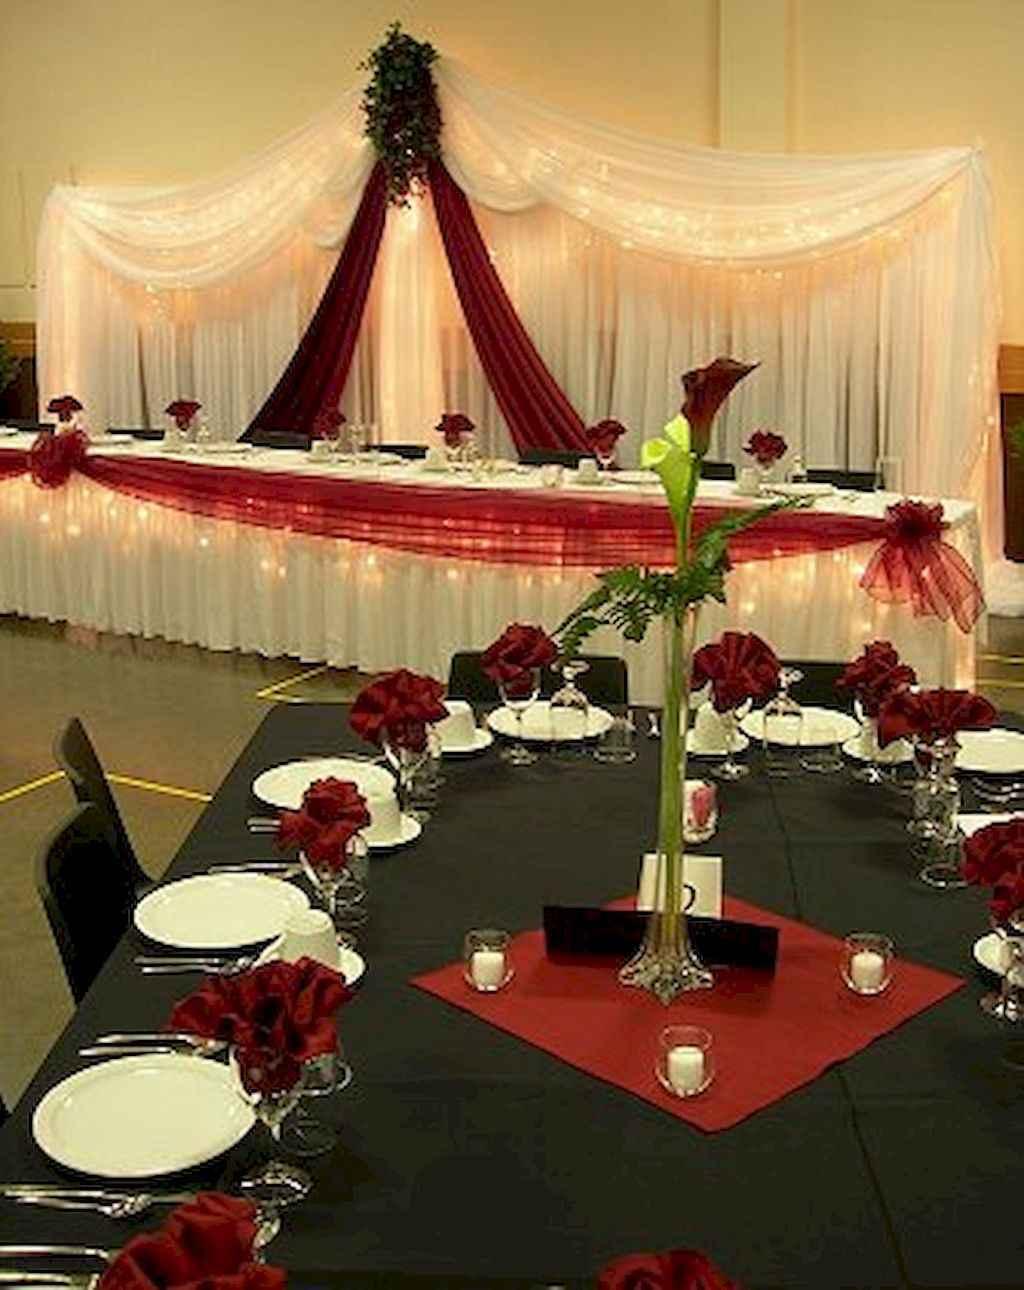 66 Romantic Valentines Table Settings Decor Ideas (45)